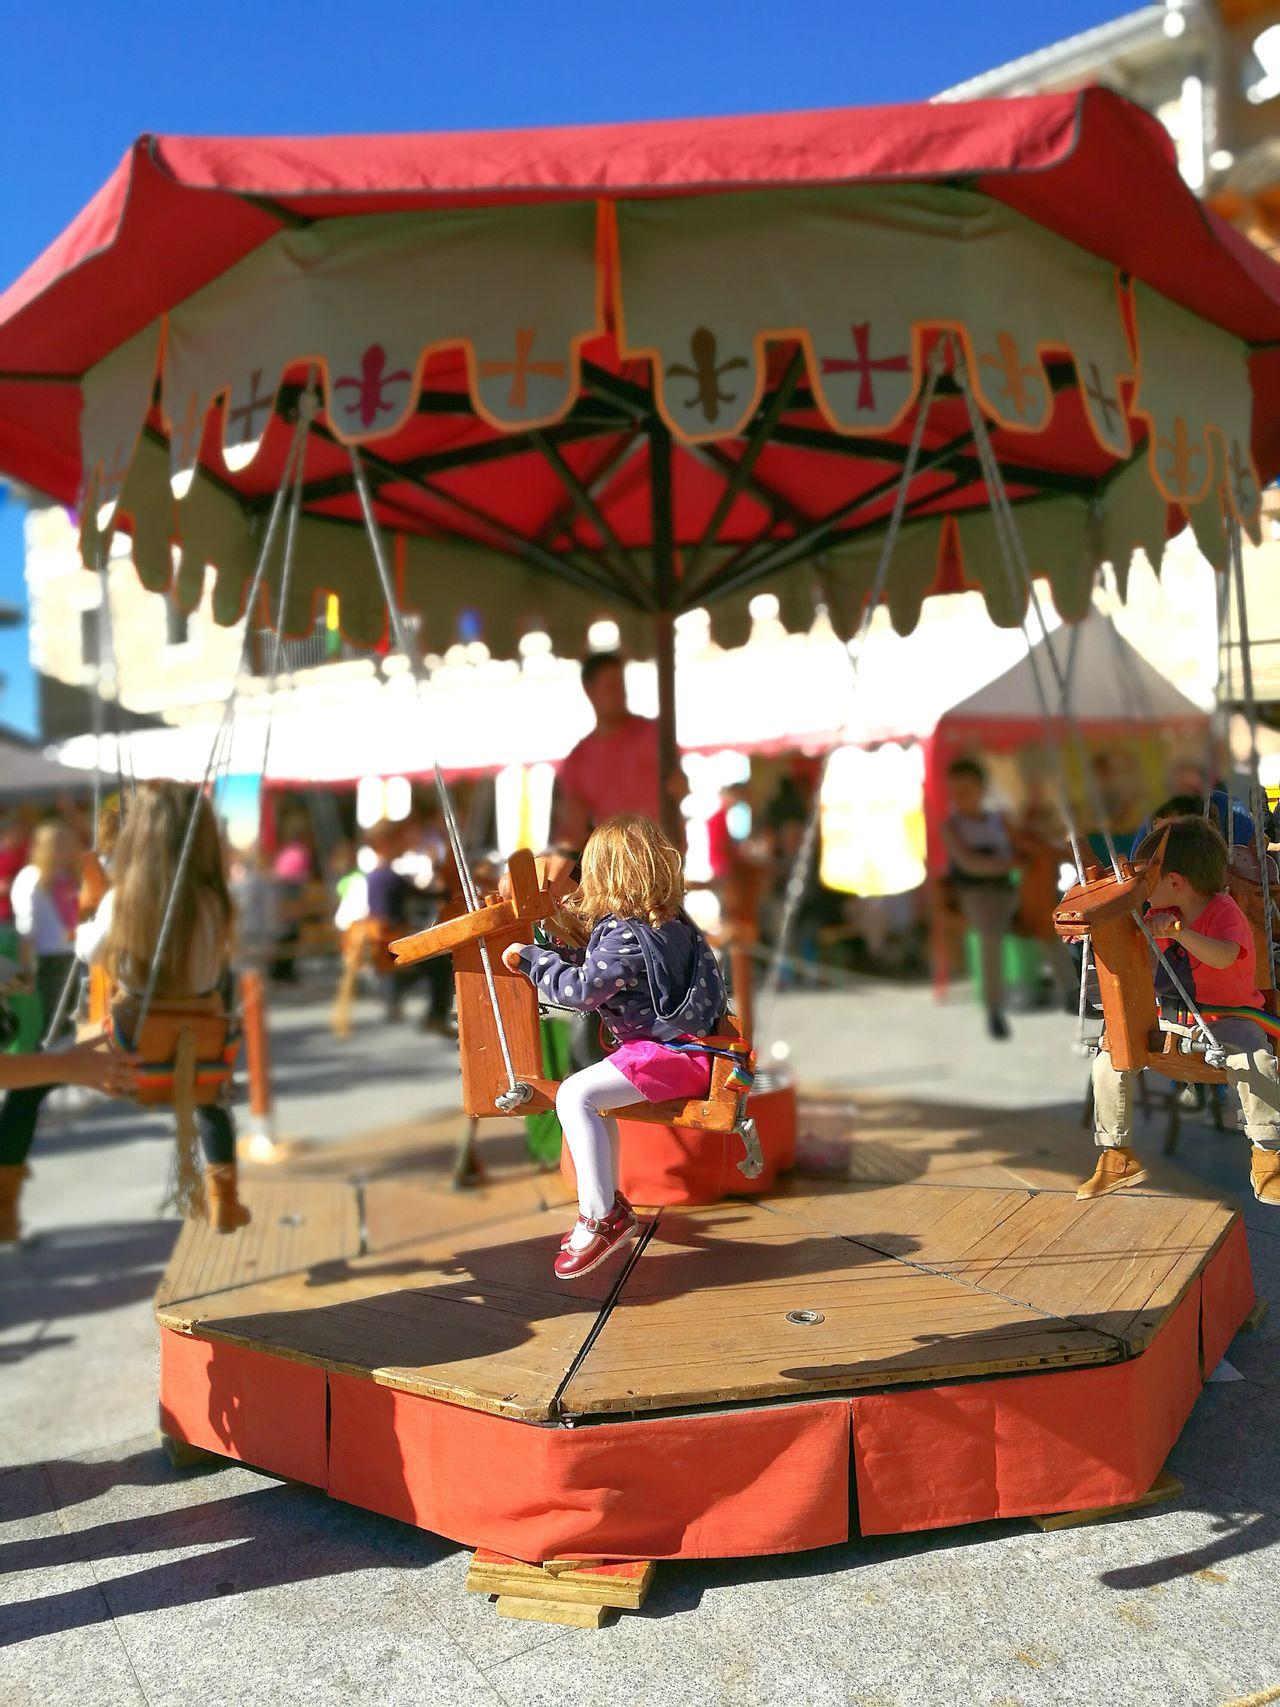 Divertimento Medieval Caballitos Madera Mercado Medieval Carousel Fotografia HuaweiP9 Scenics Detalle